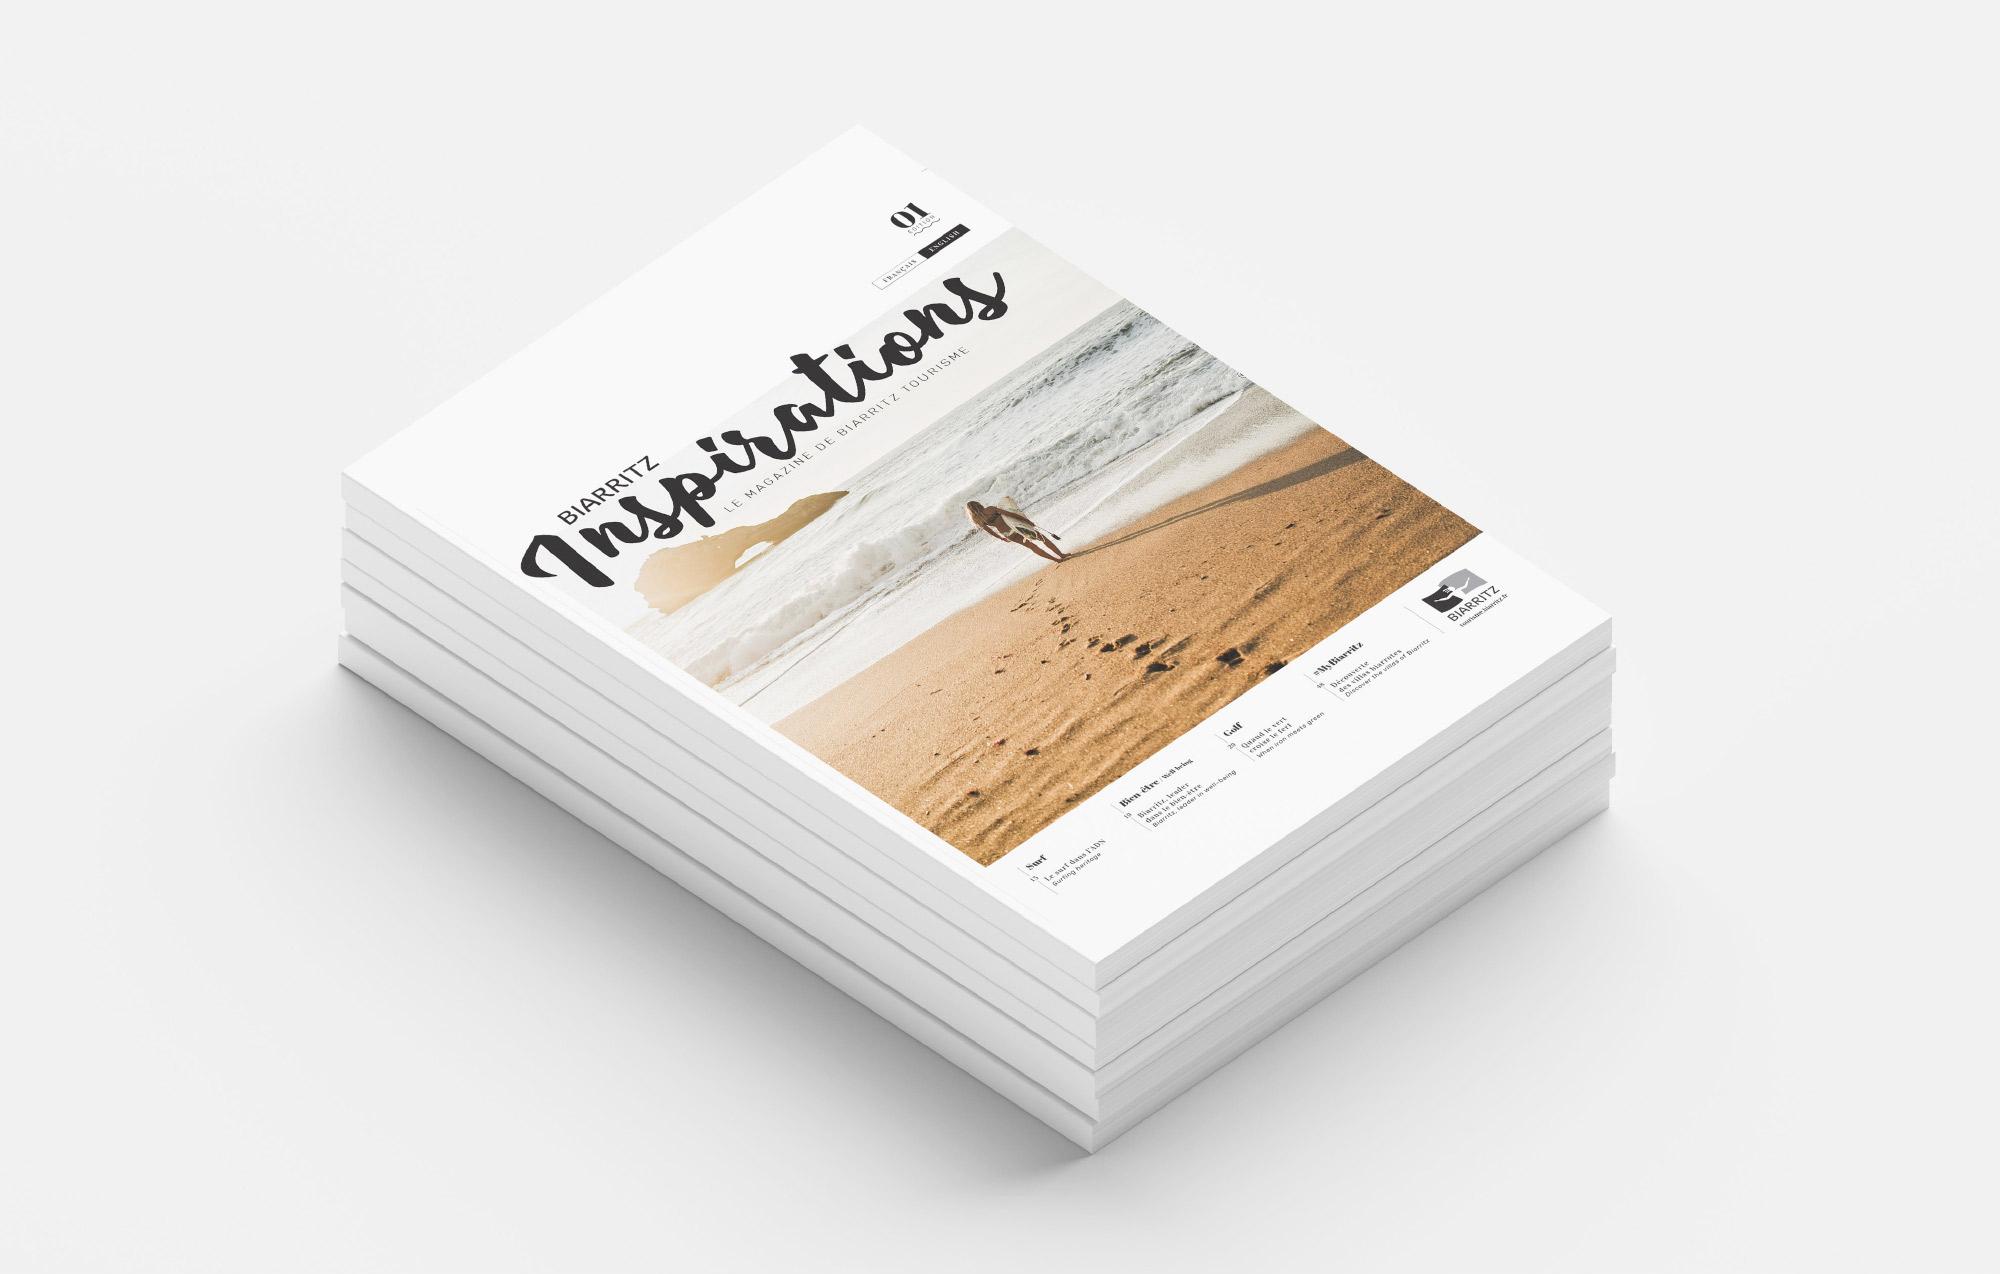 biarritz inspiration magazine touristique